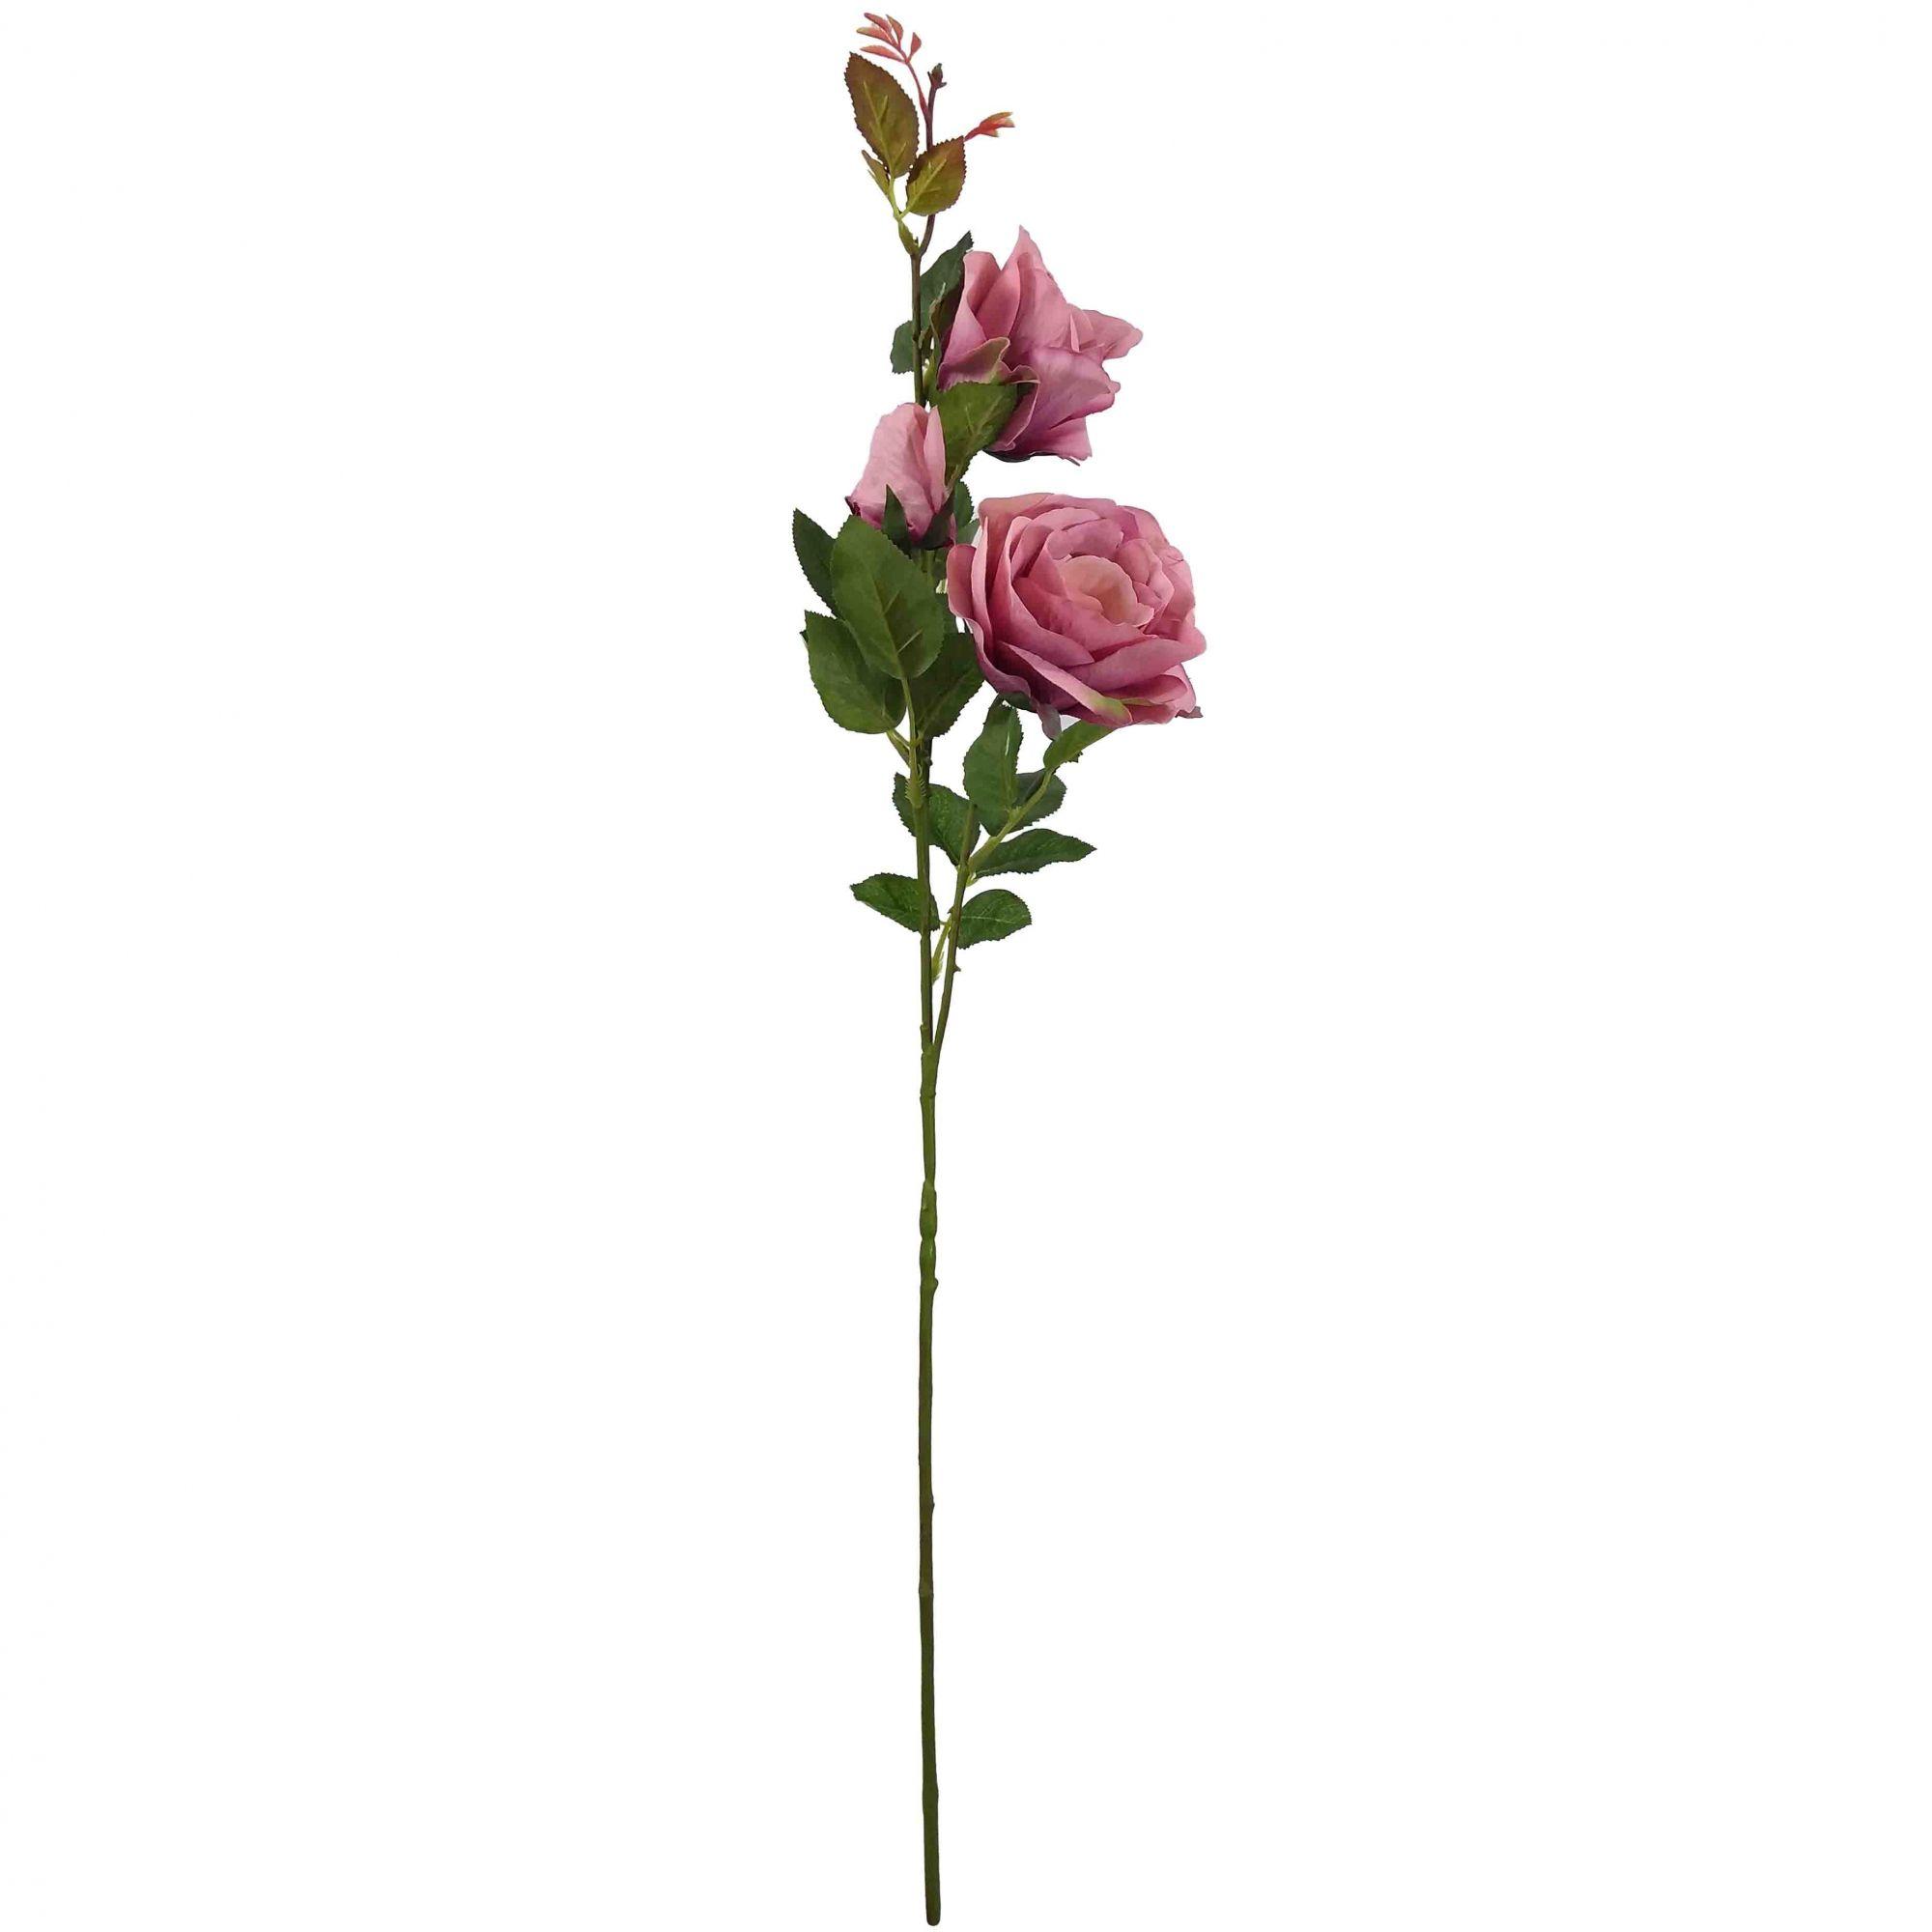 Flor Rosa Cor Rosa Outono Artificial Permanente 76CM 37365-005